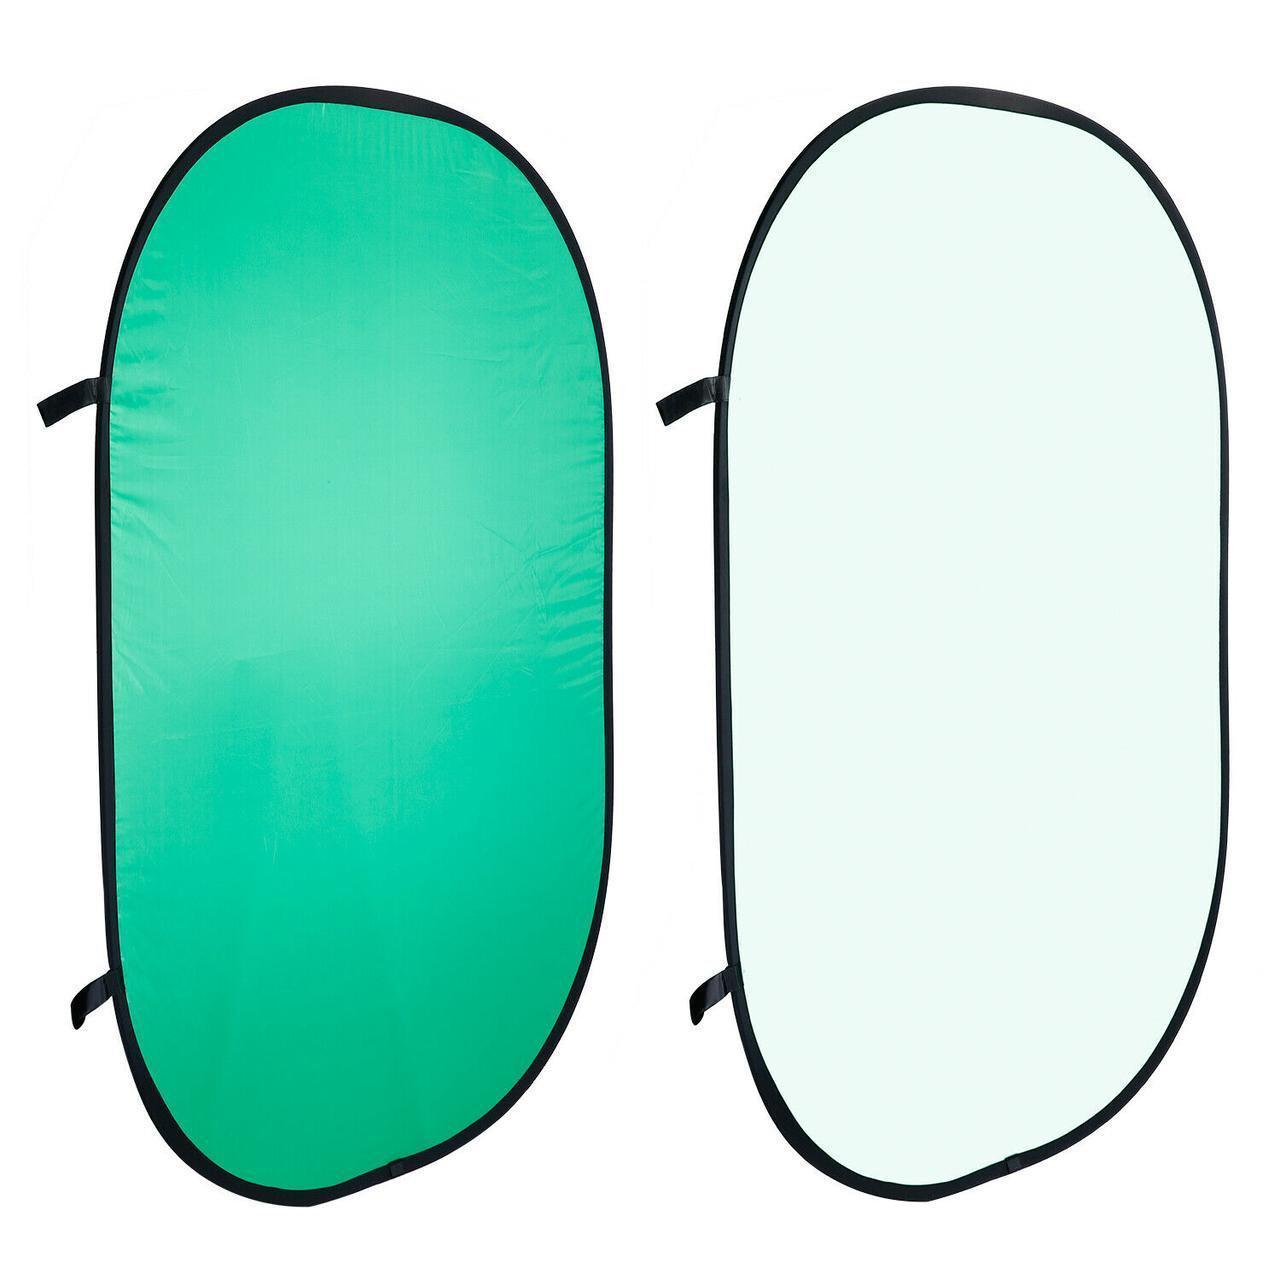 1,5x2м Фон хромакей на пружине Visico BP-028 2в1 Chroma Key (зелёный / белый) складной